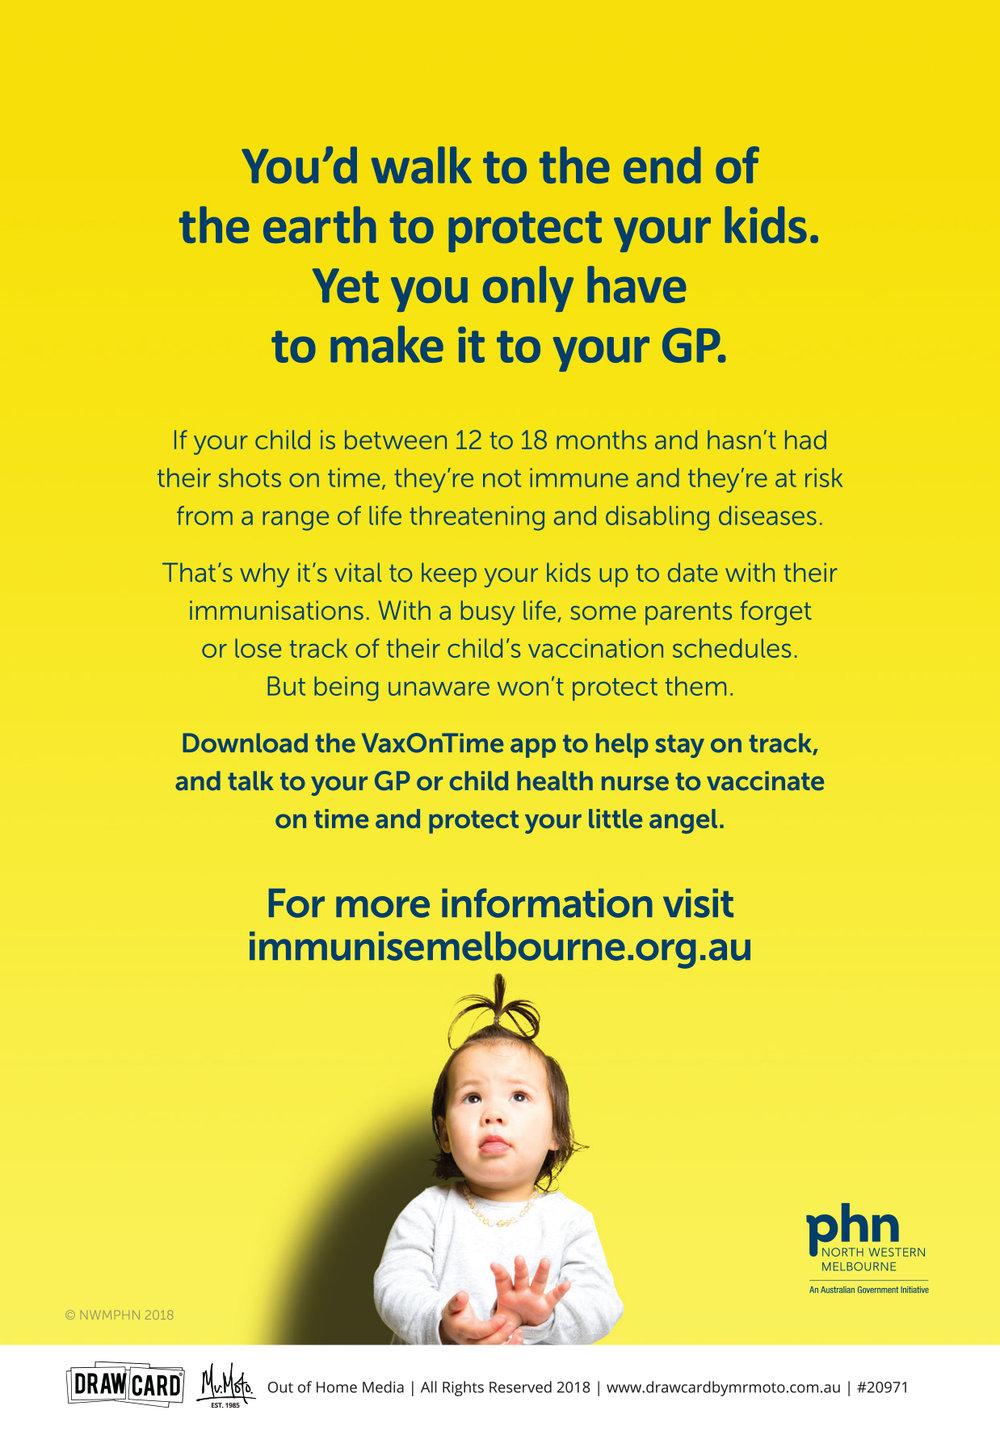 11245_Immunise_Melb_151x101_Postcard_B_HR-2.jpg